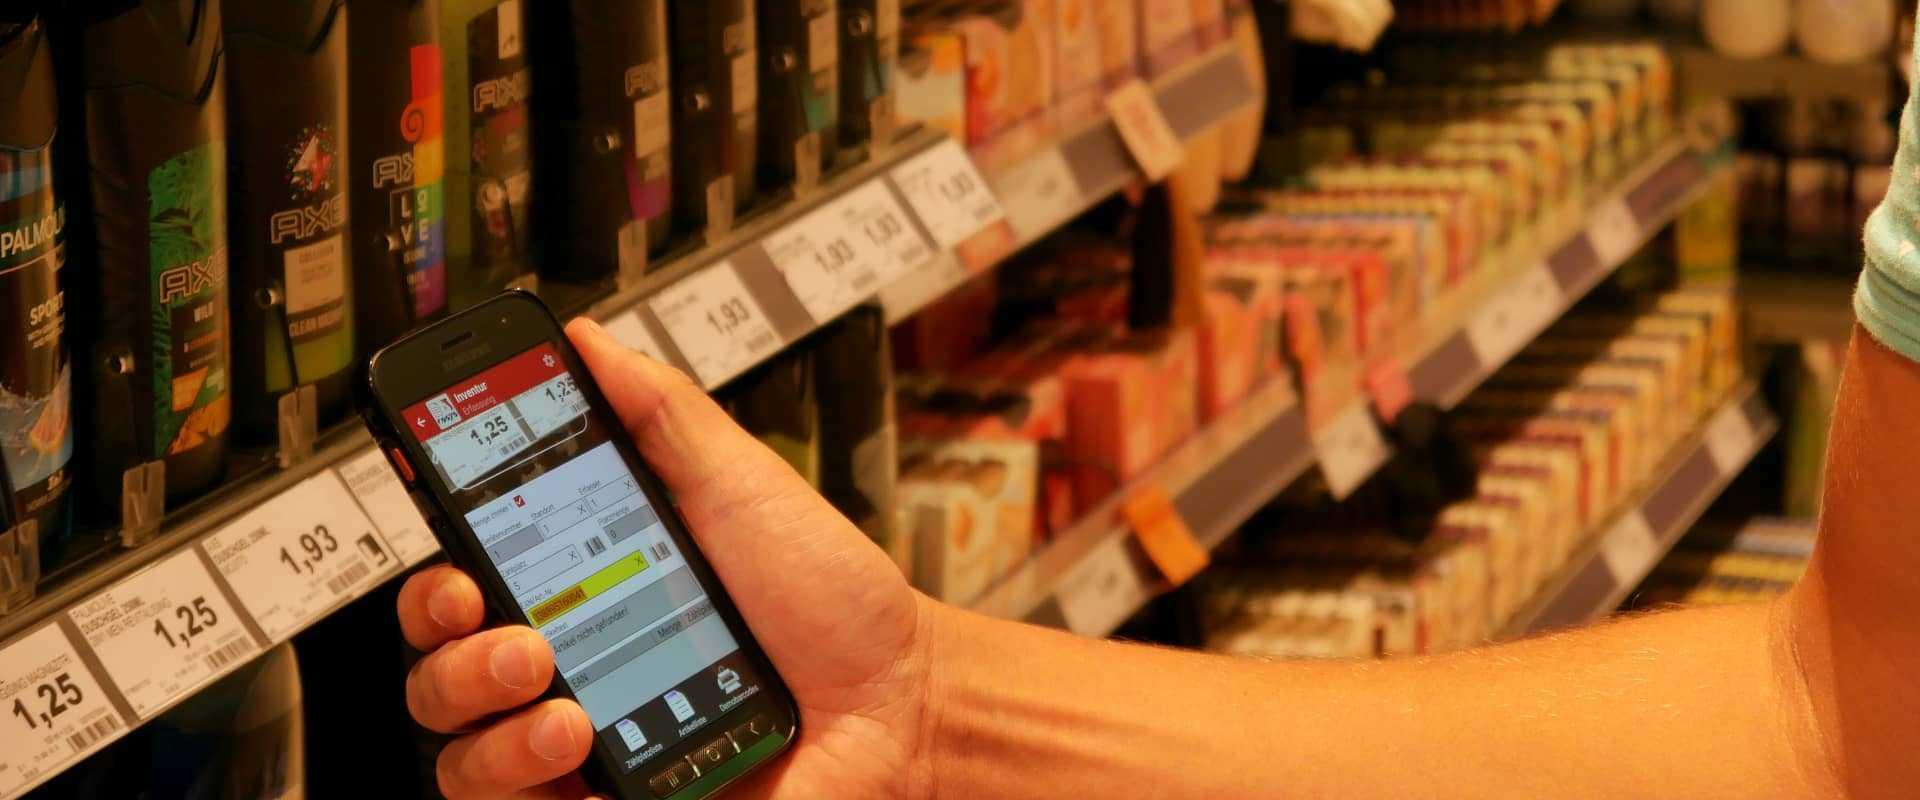 COSYS mobile Software für Smartphones und MDE Geräte